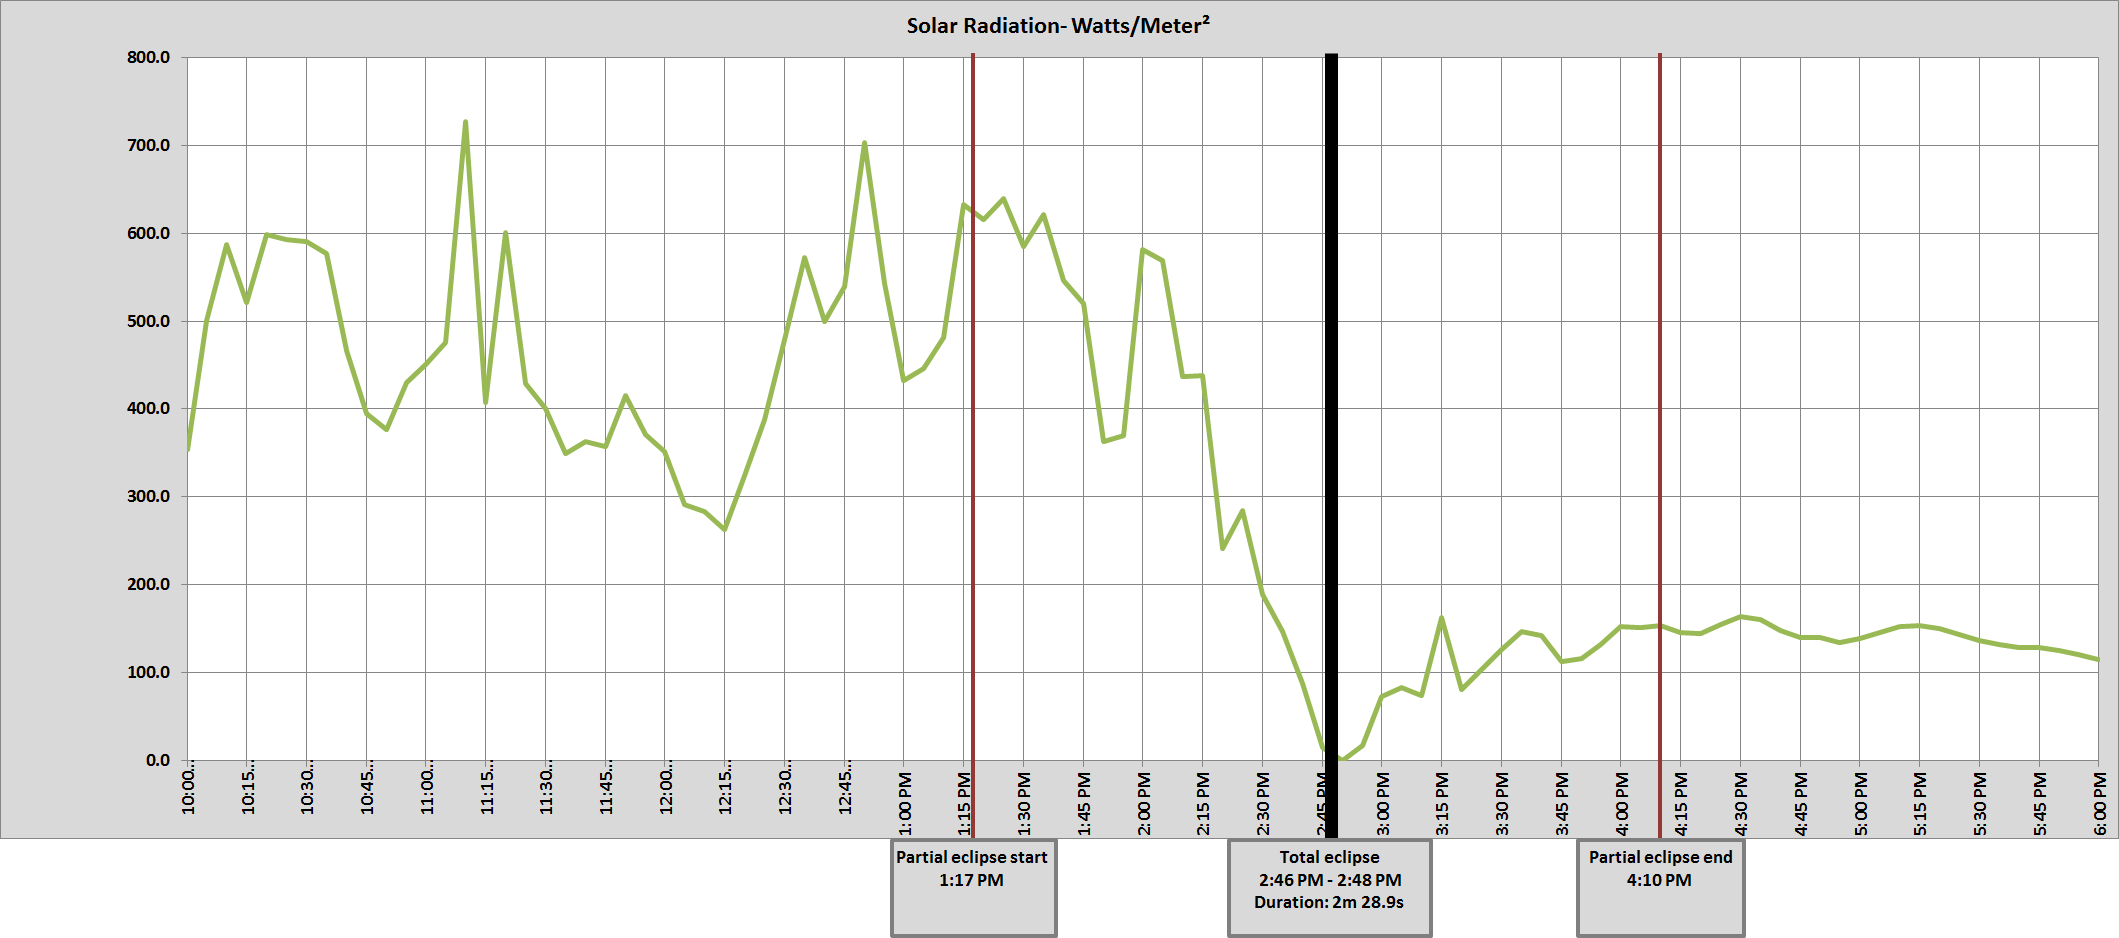 Graph of McClellanville, SC solar radiation